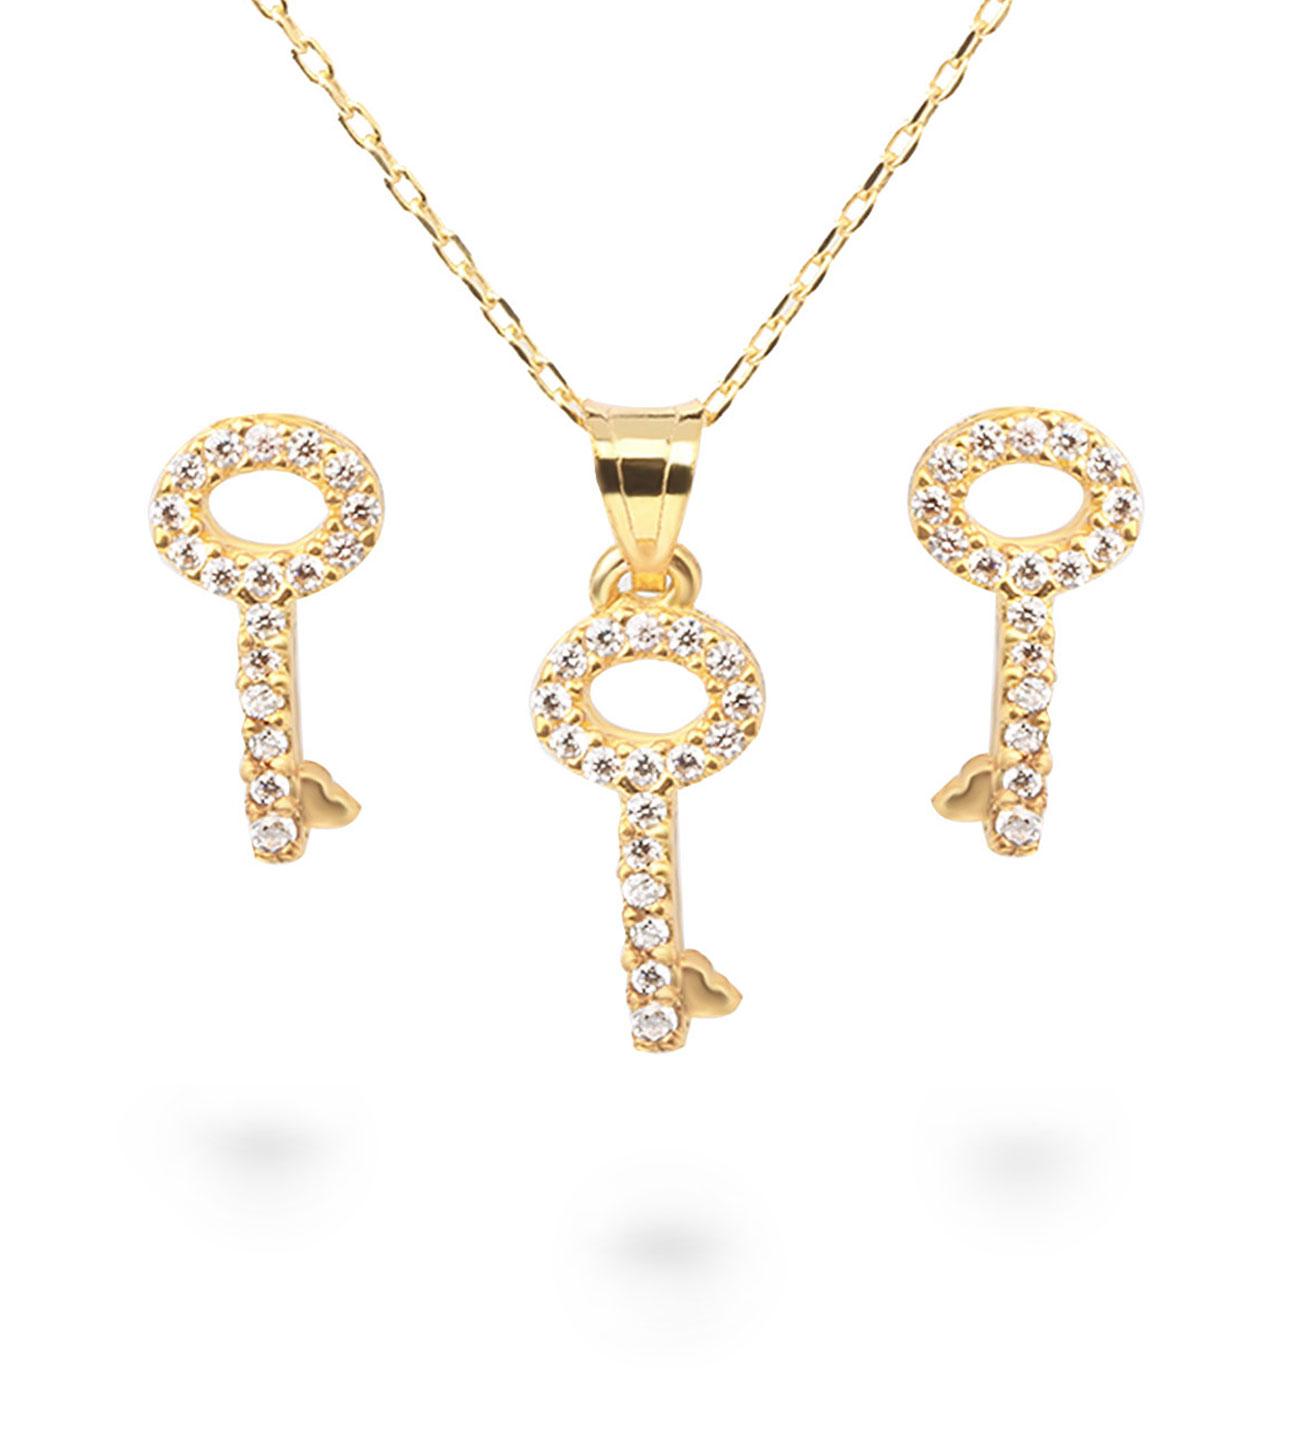 Gemmed Key Pendant Gold Necklace & Earrings Set